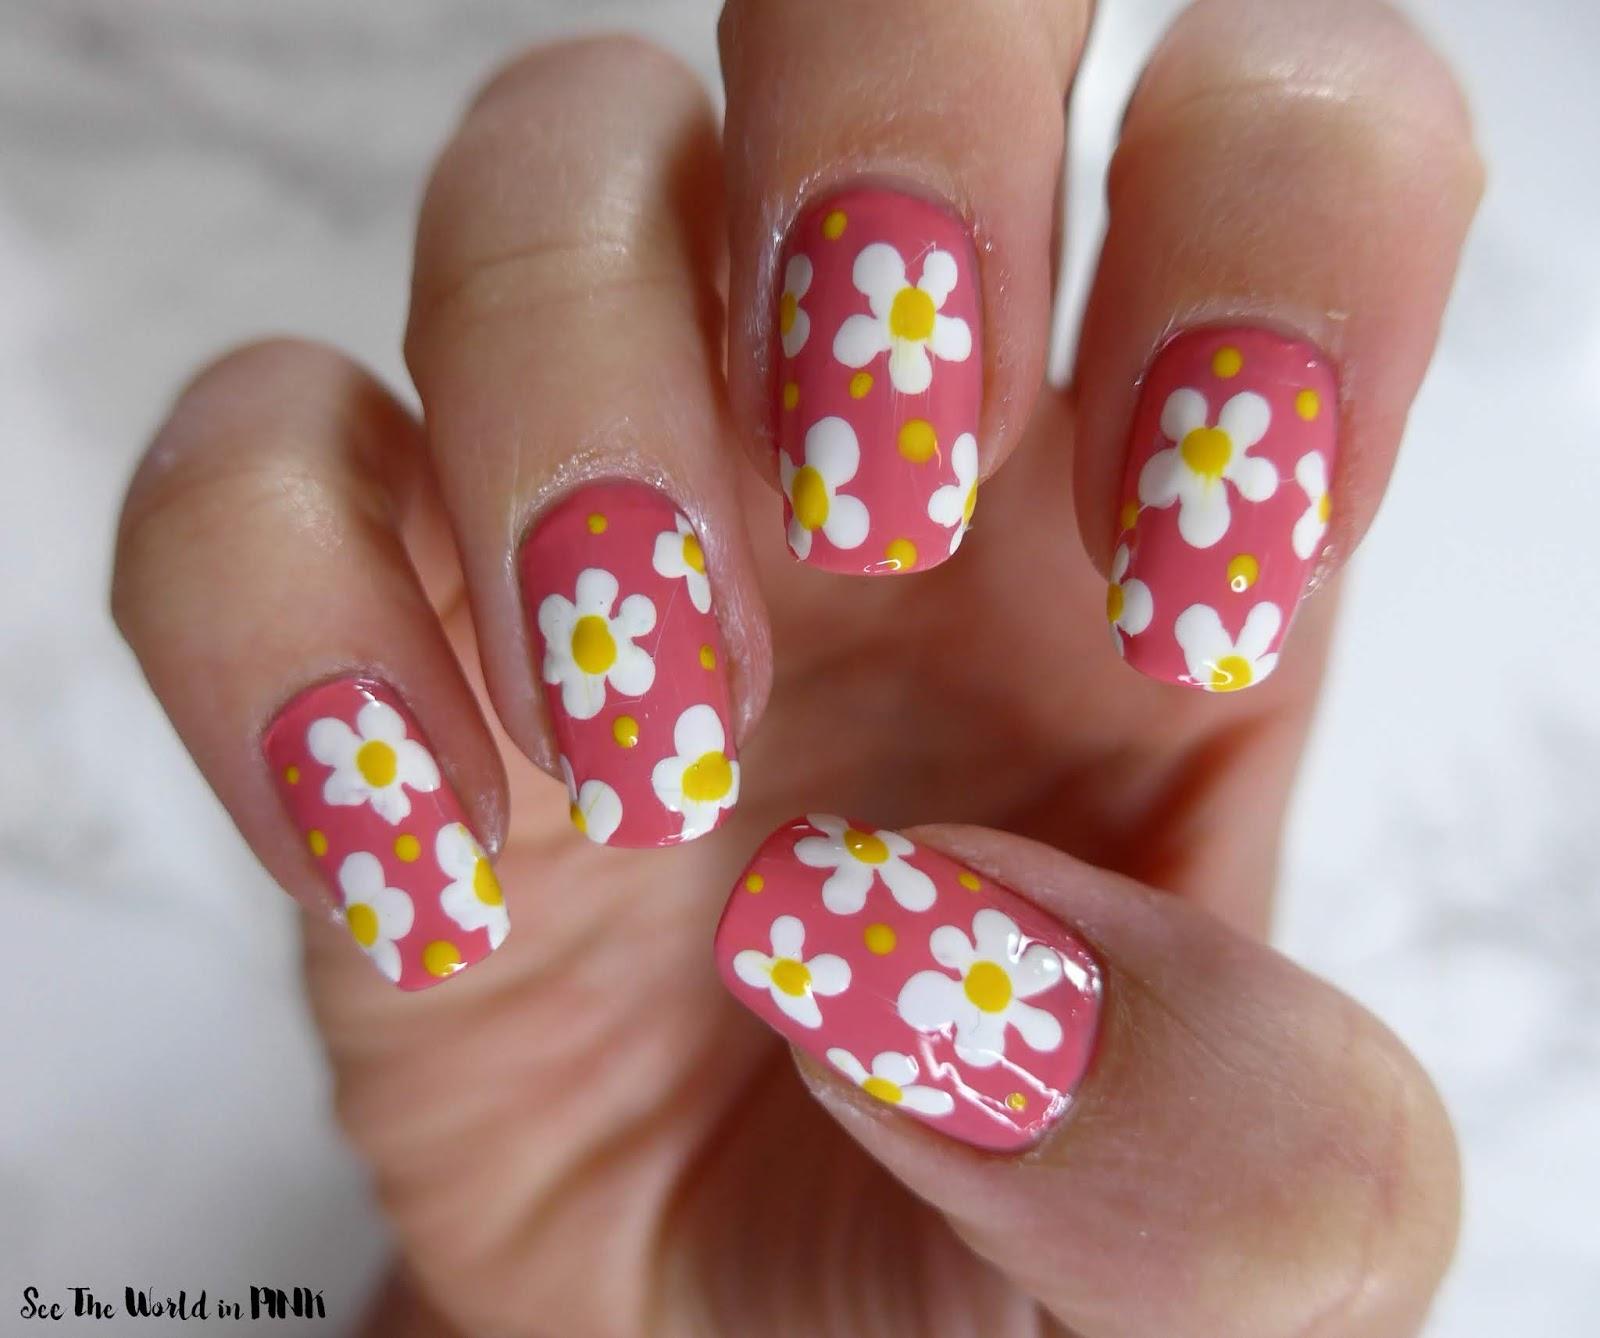 Field of Daisies Floral Nail Art